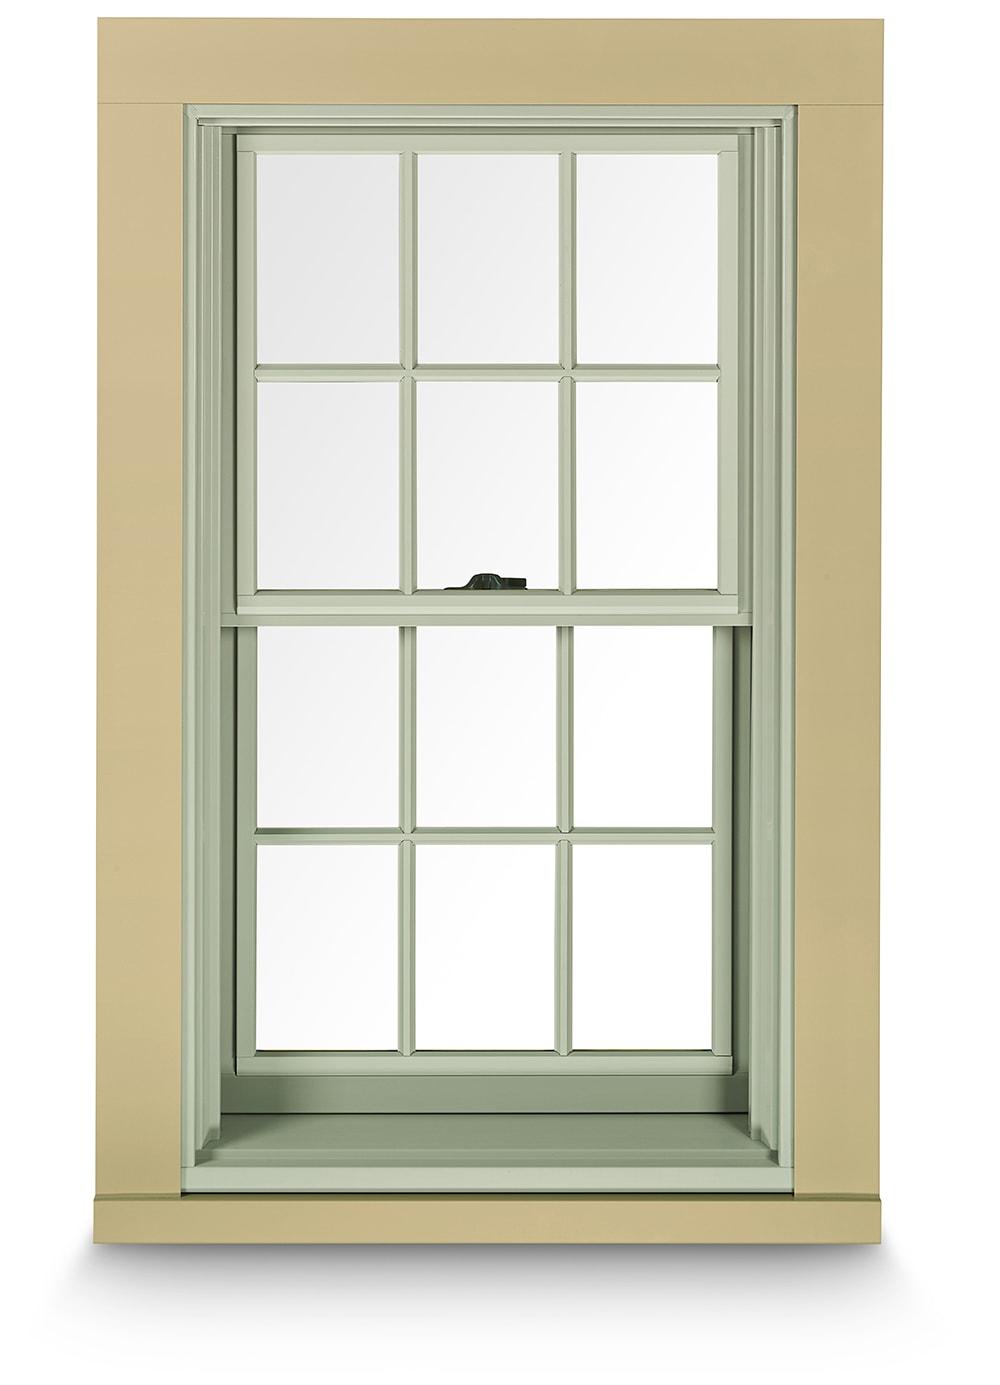 Andersen 400 s series windows mtb windows and more for Andersen window 400 series